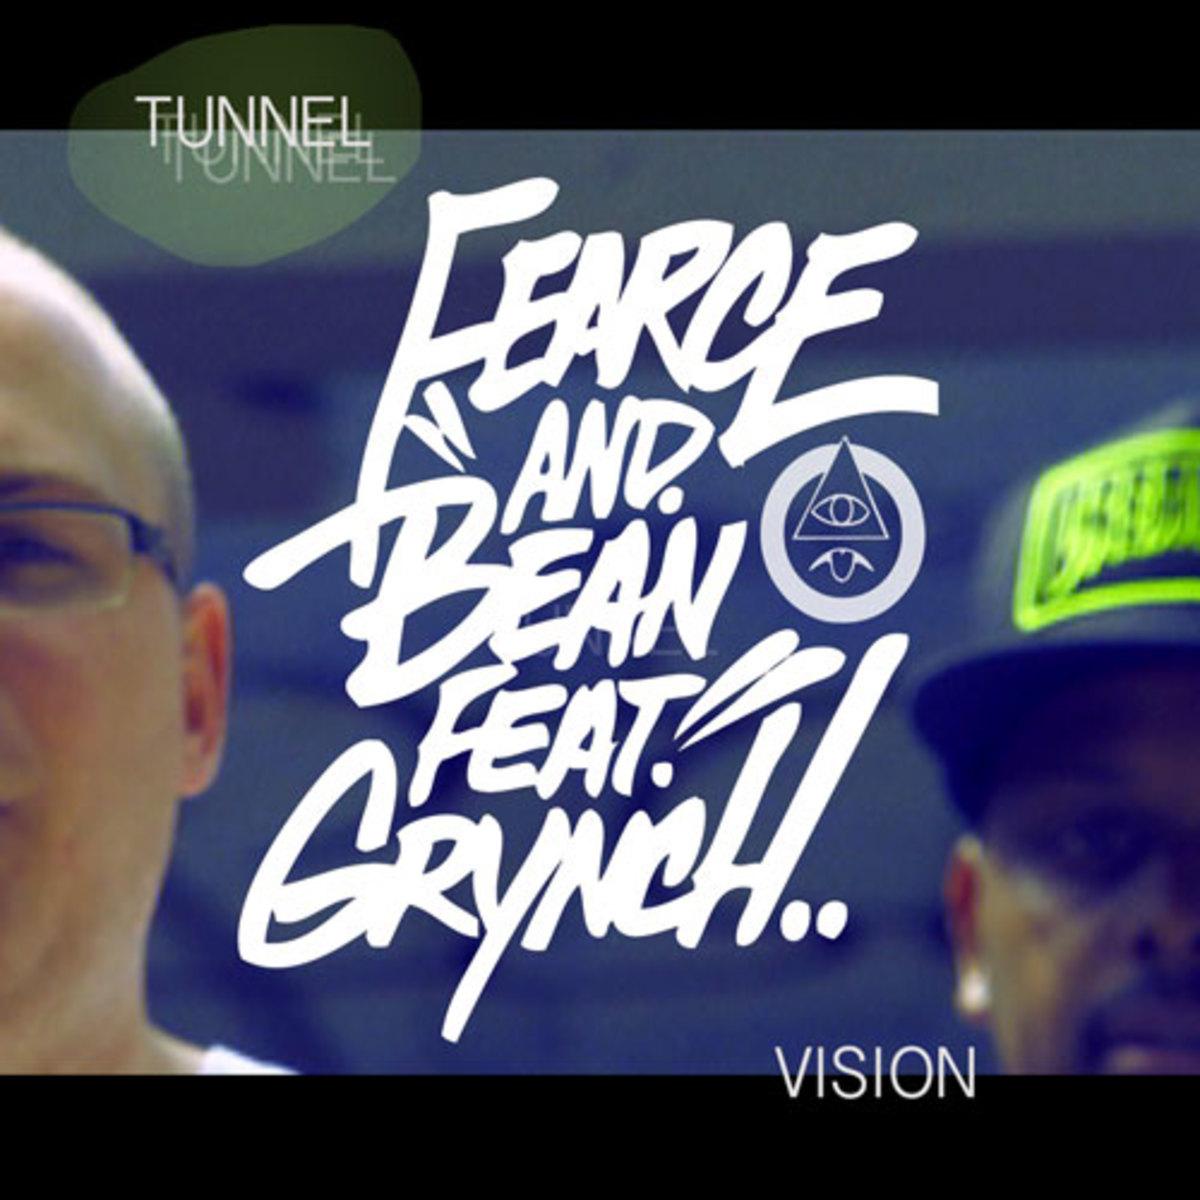 fearcebean-tunnel.jpg